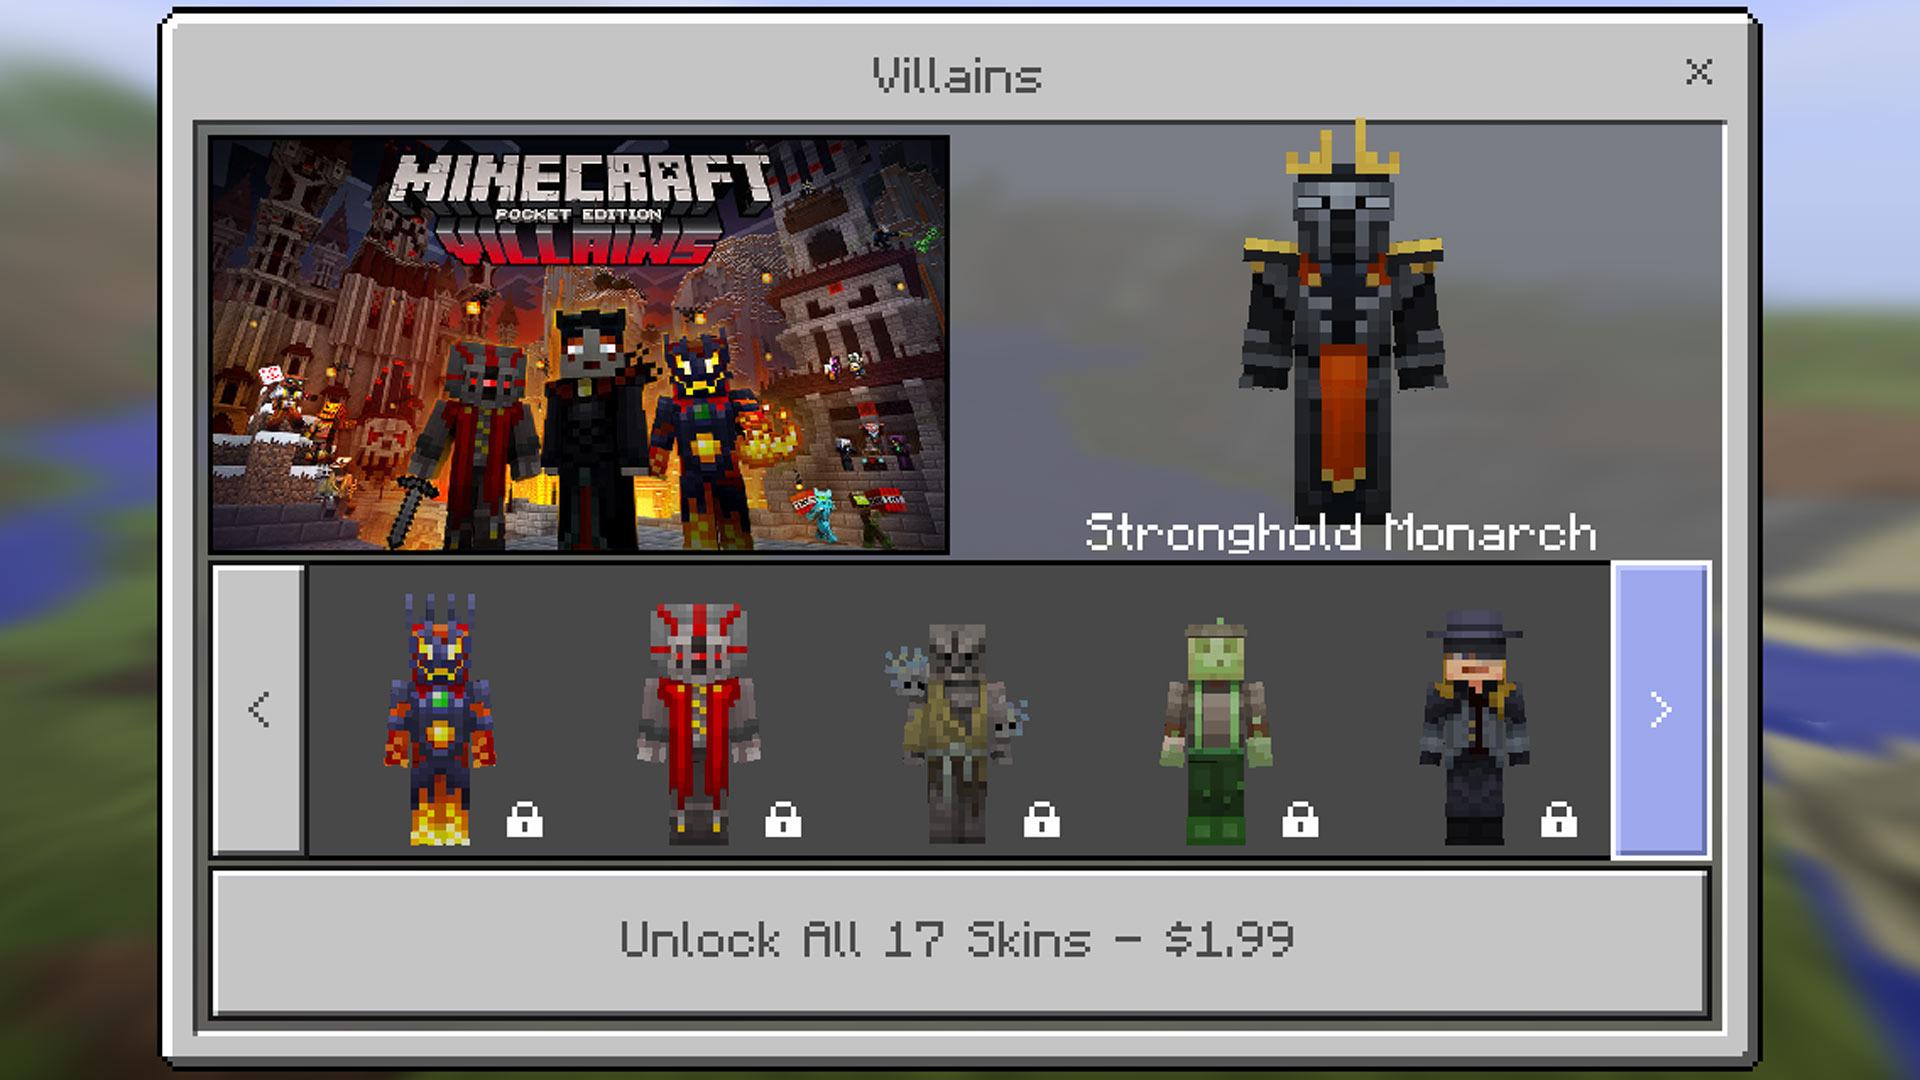 Minecraft pocket edition villains skin pack